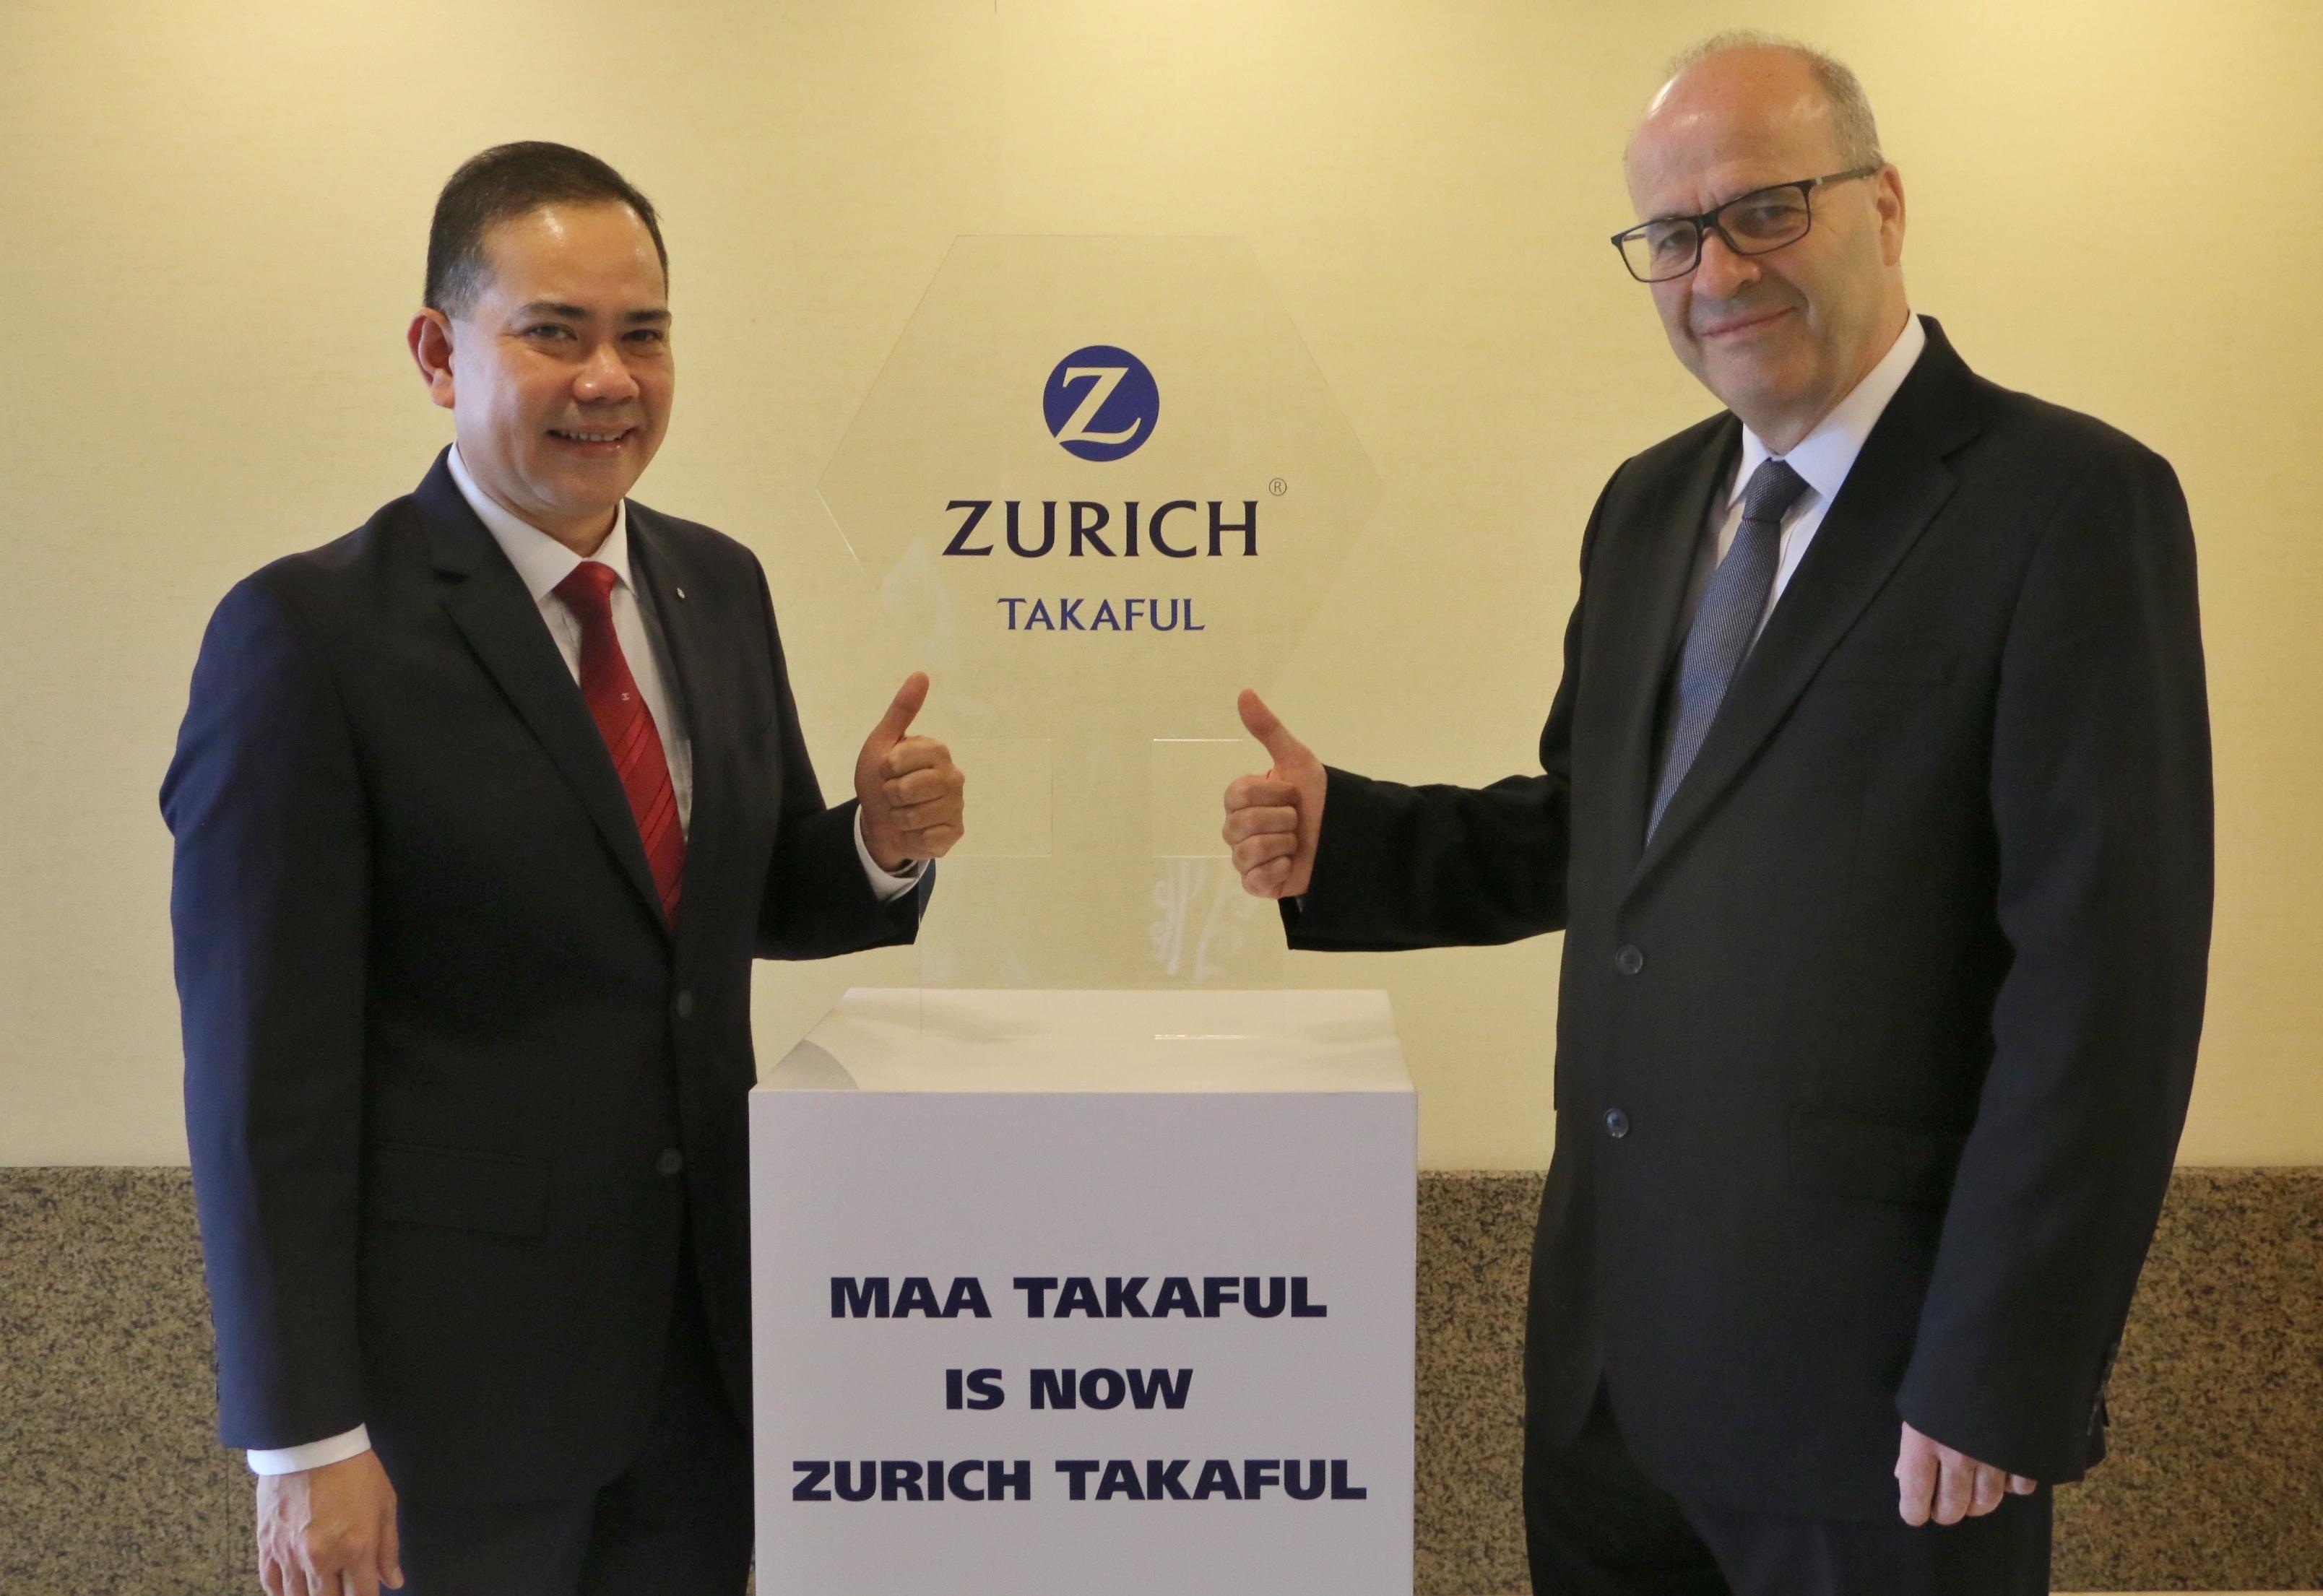 Maa Takaful Berhad Has Been Renamed To Zurich Takaful Malaysia Berhad 2016 Zurich In The News Media Zurich Malaysia